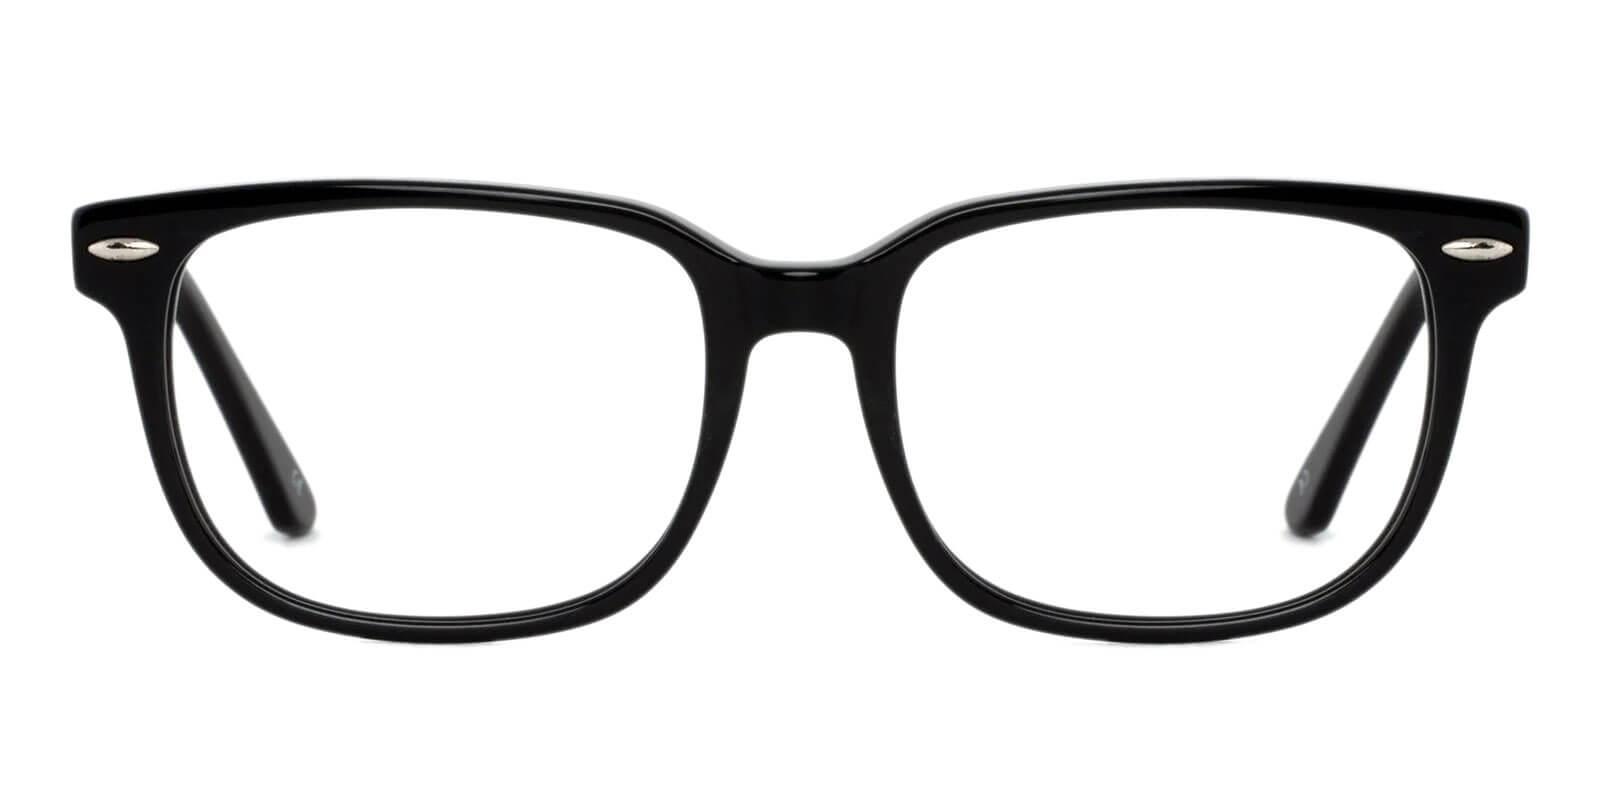 Christy Black Acetate Eyeglasses , SpringHinges , UniversalBridgeFit Frames from ABBE Glasses